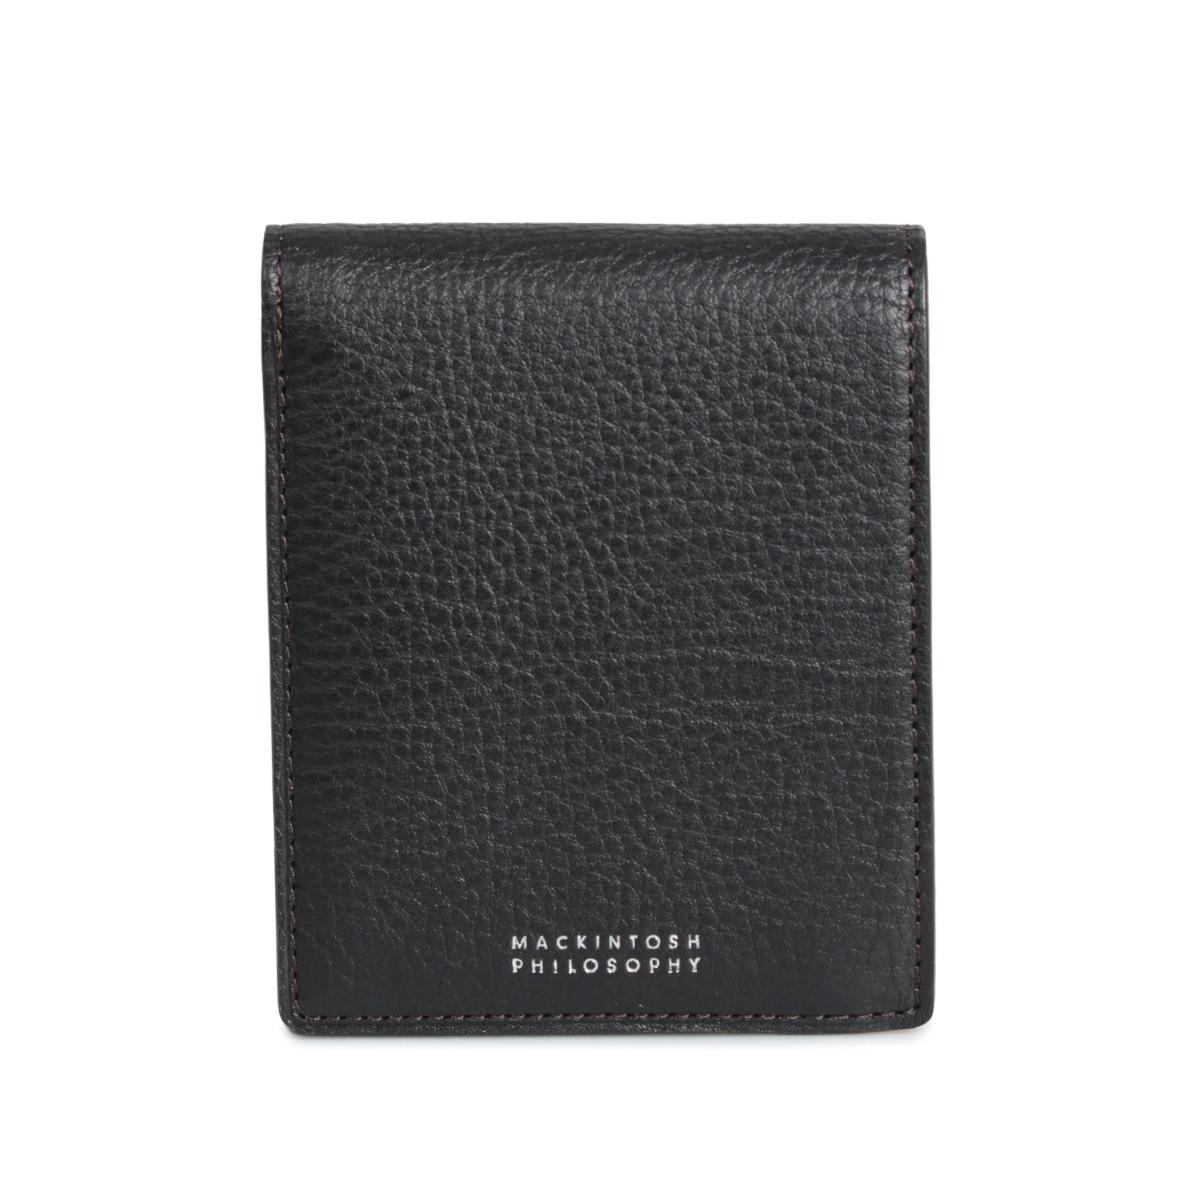 MACKINTOSH PHILOSOPHY BI-FOLD WALLET マッキントッシュ フィロソフィー 財布 二つ折り メンズ 本革 ブラック ネイビー チョコ 黒 MAP213016